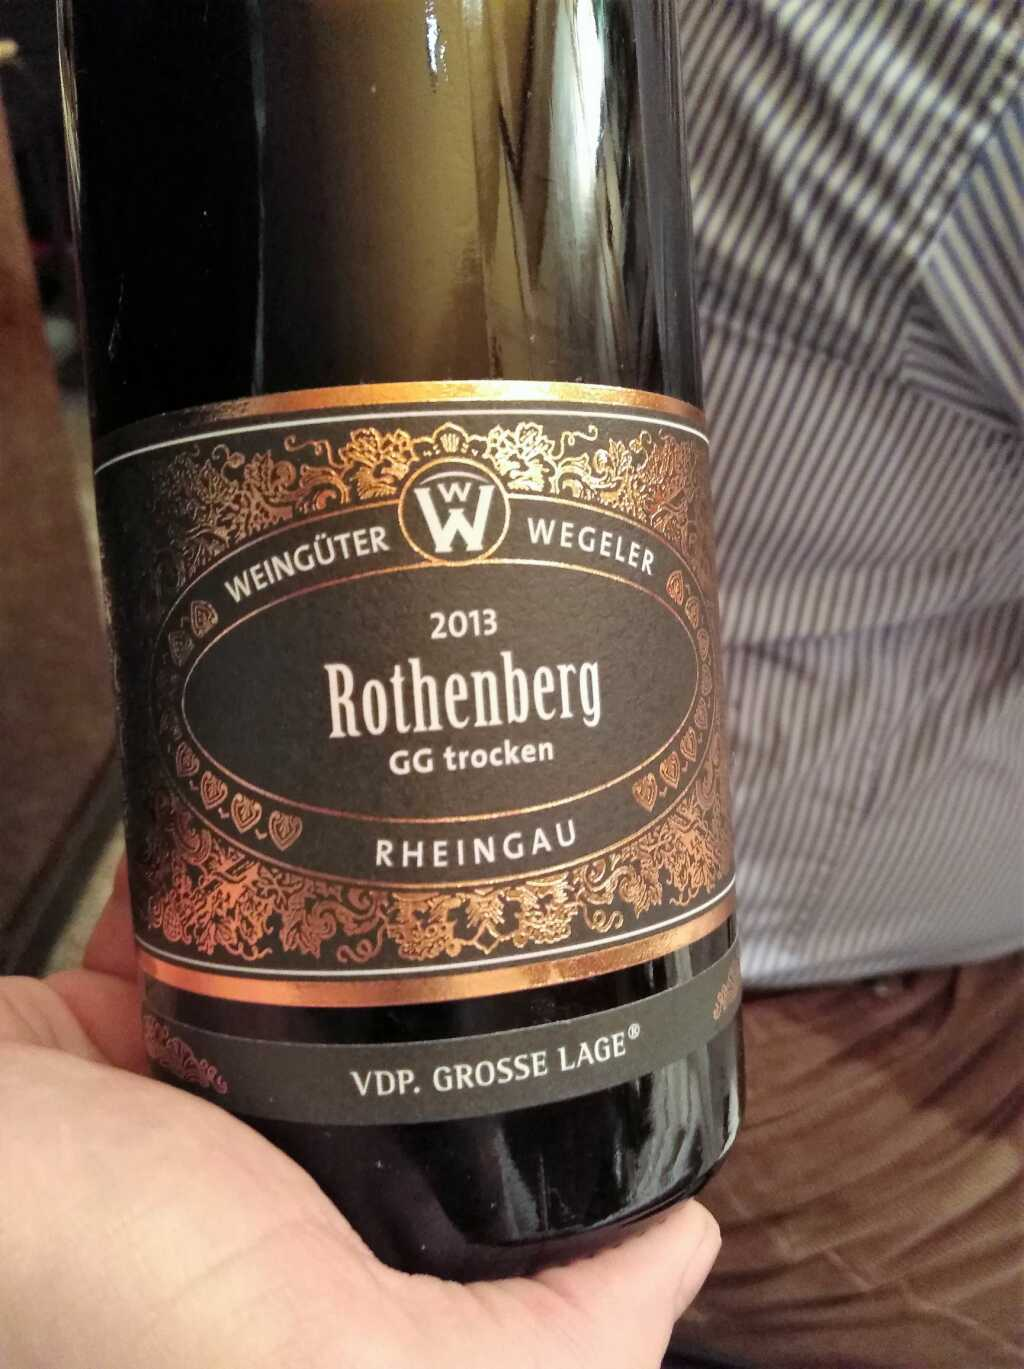 We got the Rothenberg-Feeling!